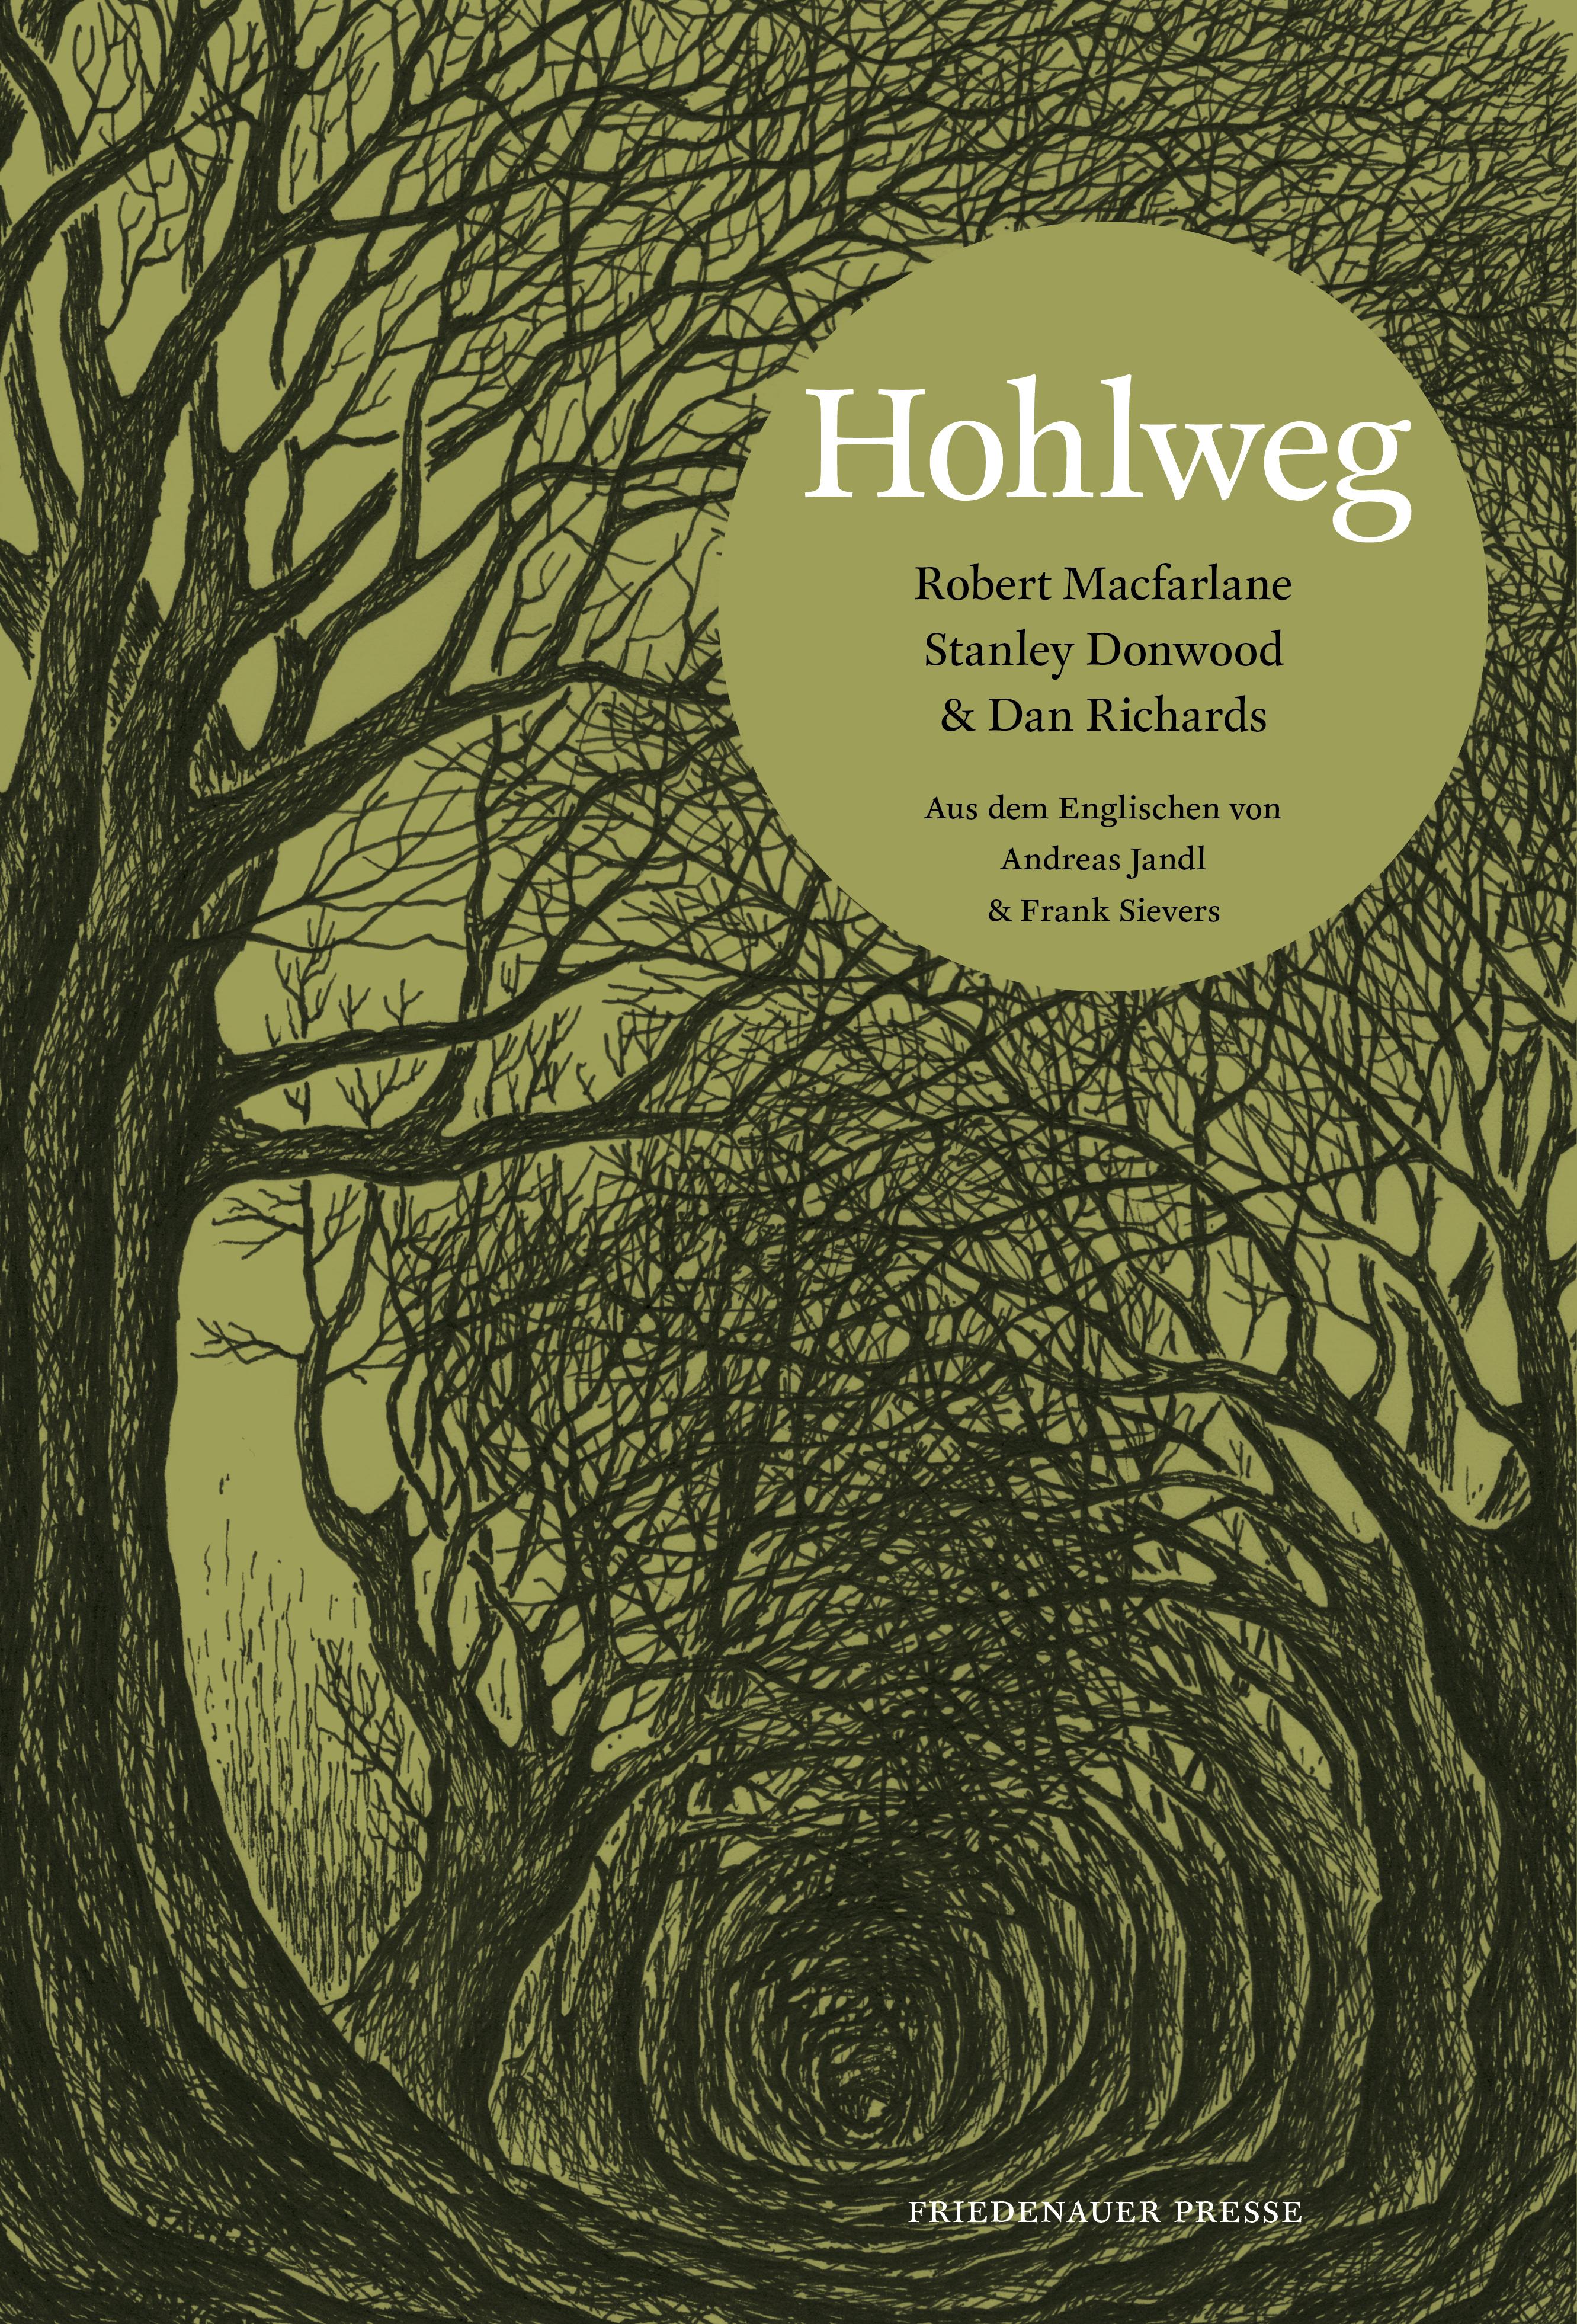 German version of Donwoods Cover for Macfarlane, Holloway